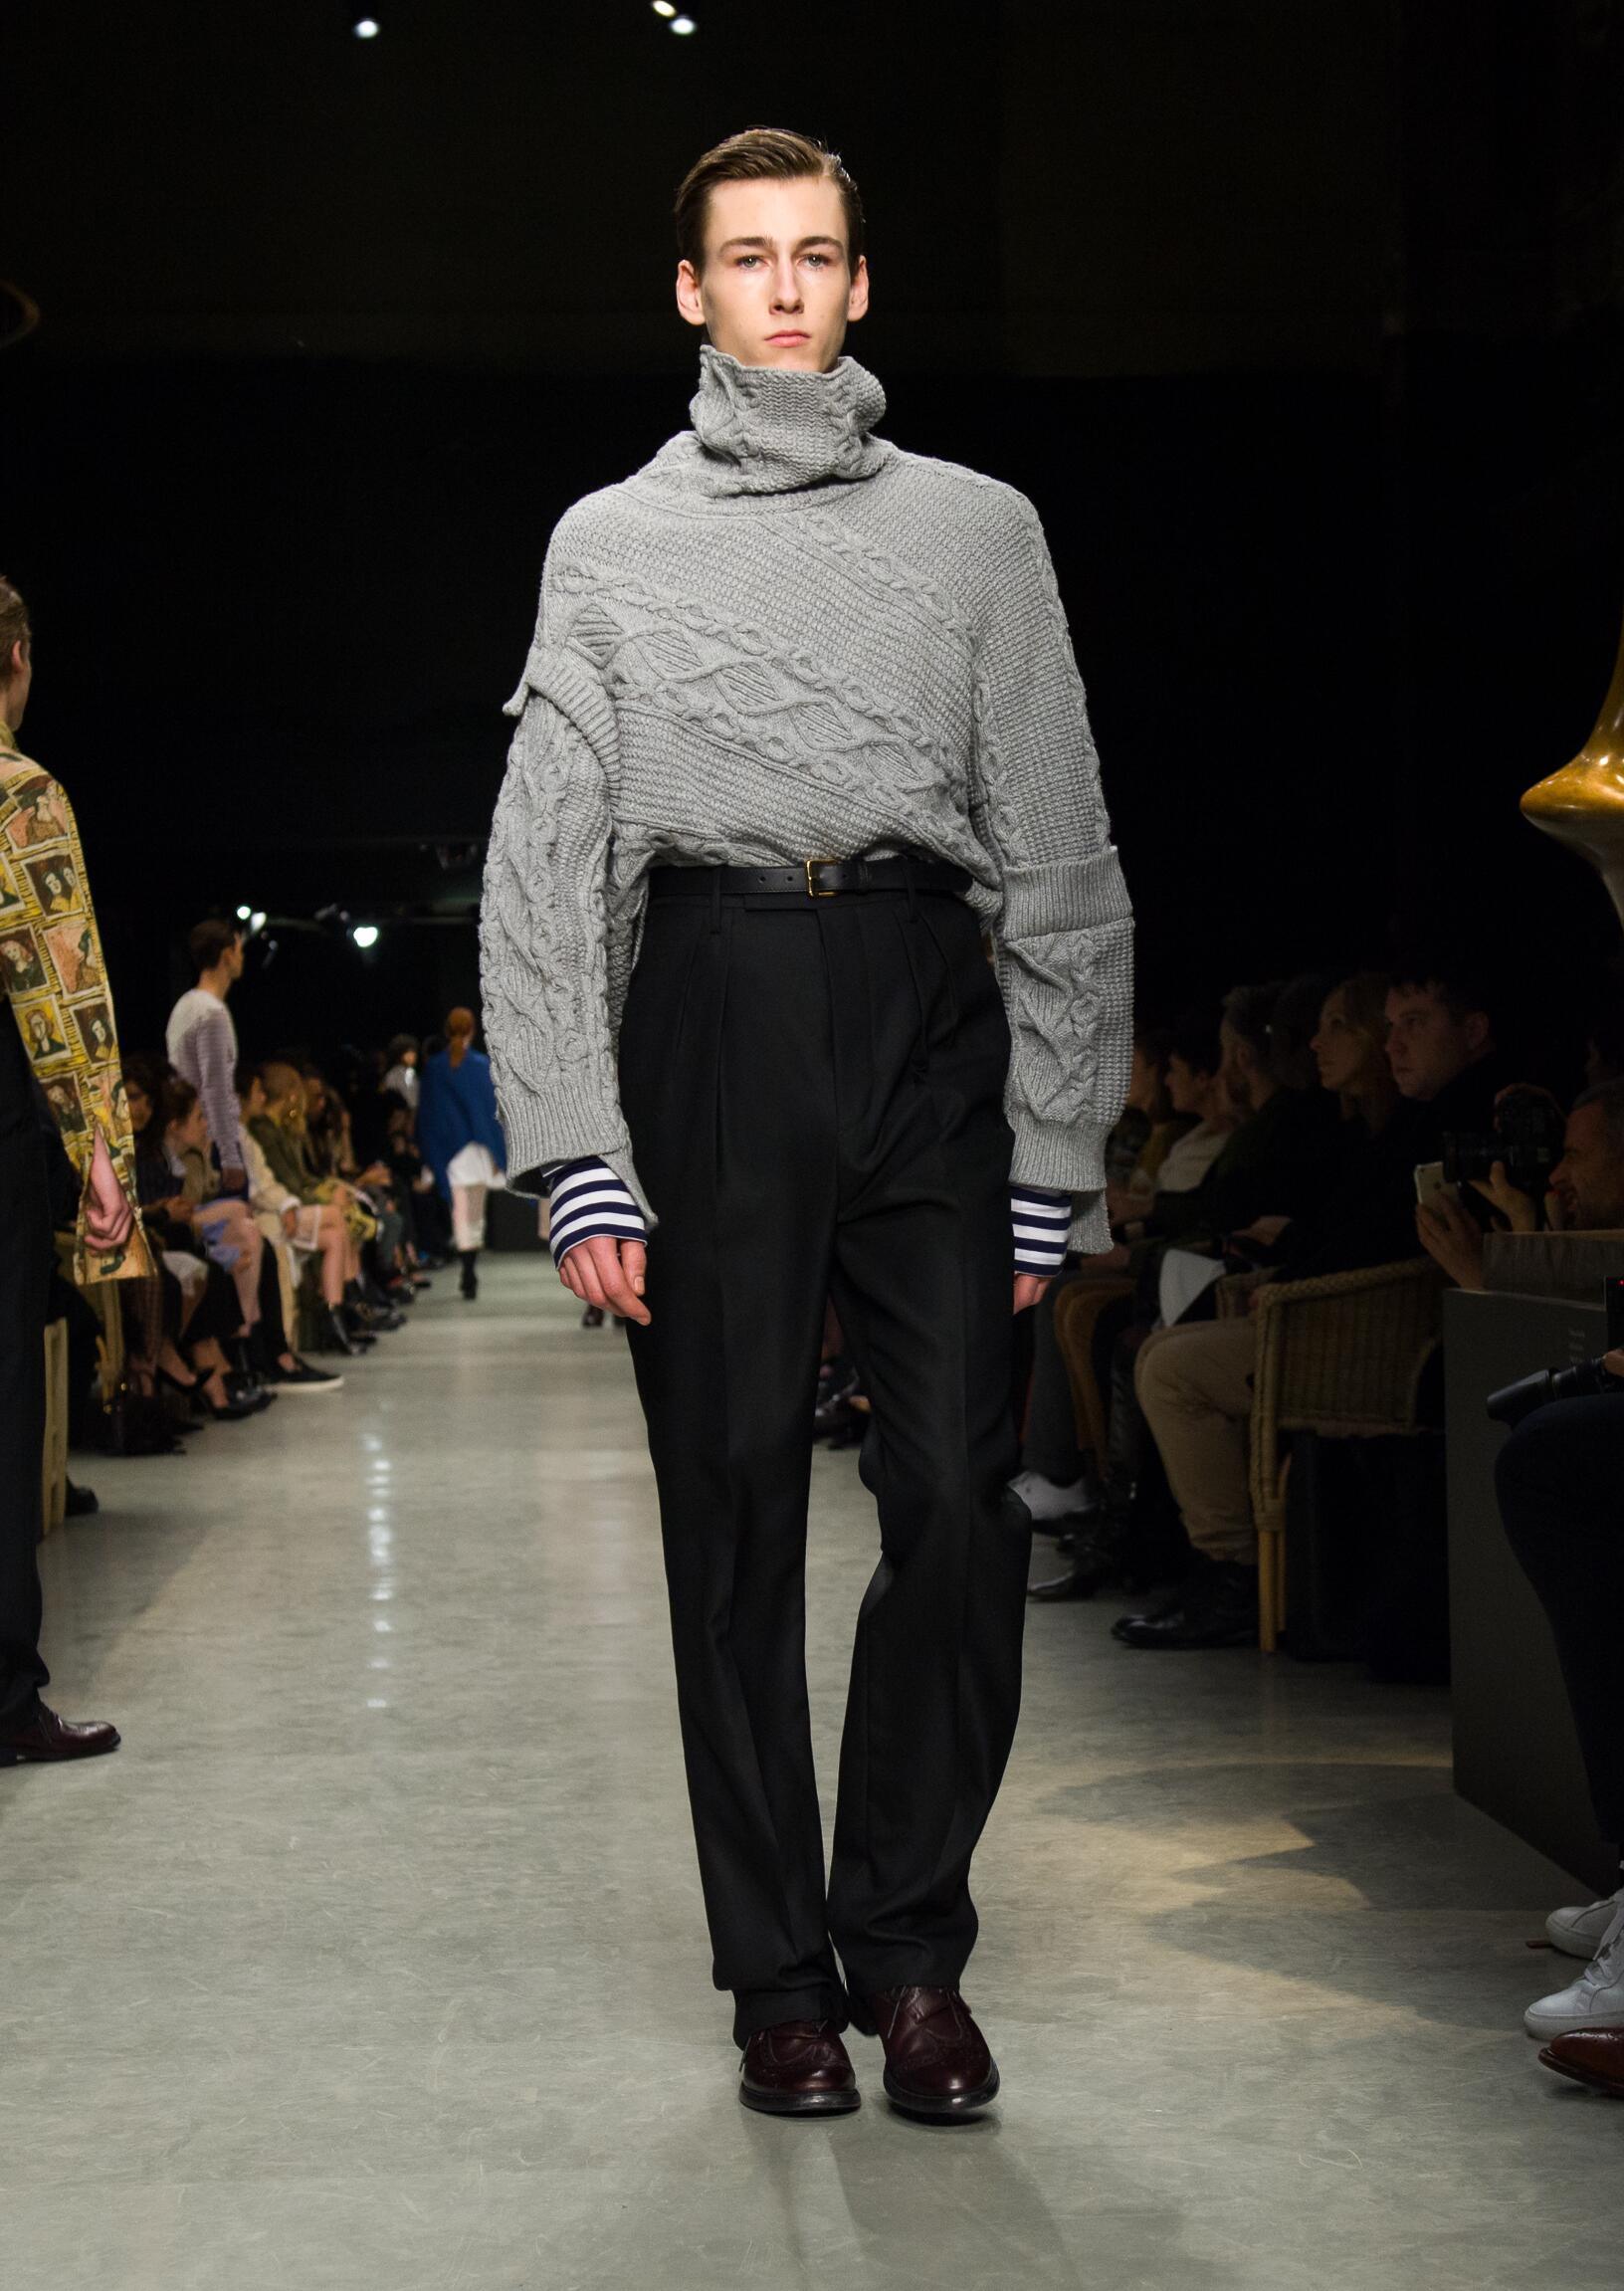 Man Model Fashion Show Burberry